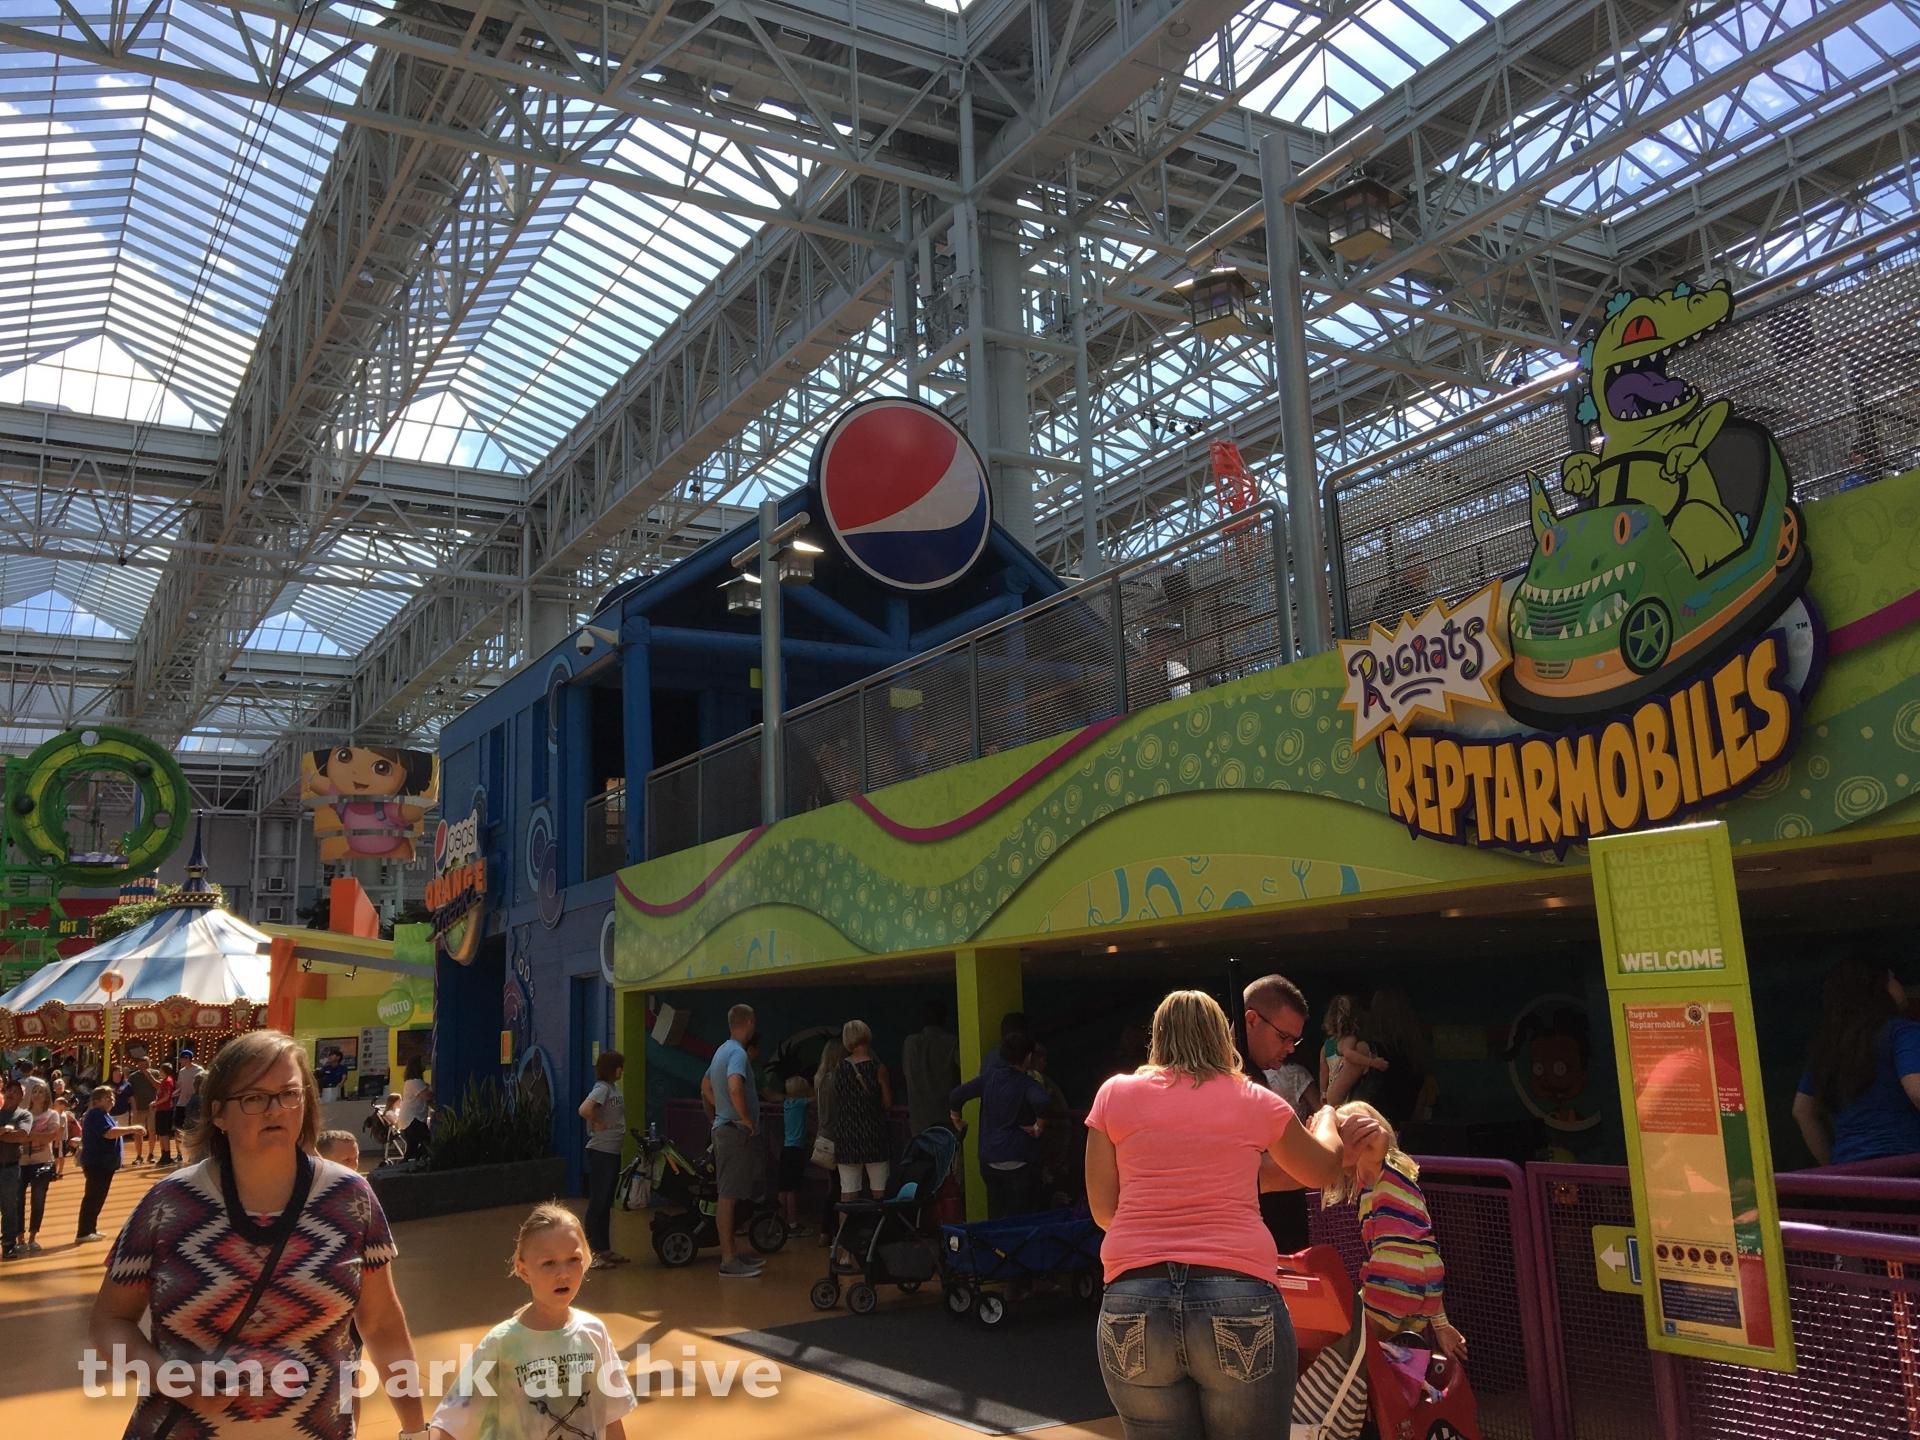 Rugrats Reptarmobiles at Nickelodeon Universe at Mall of America